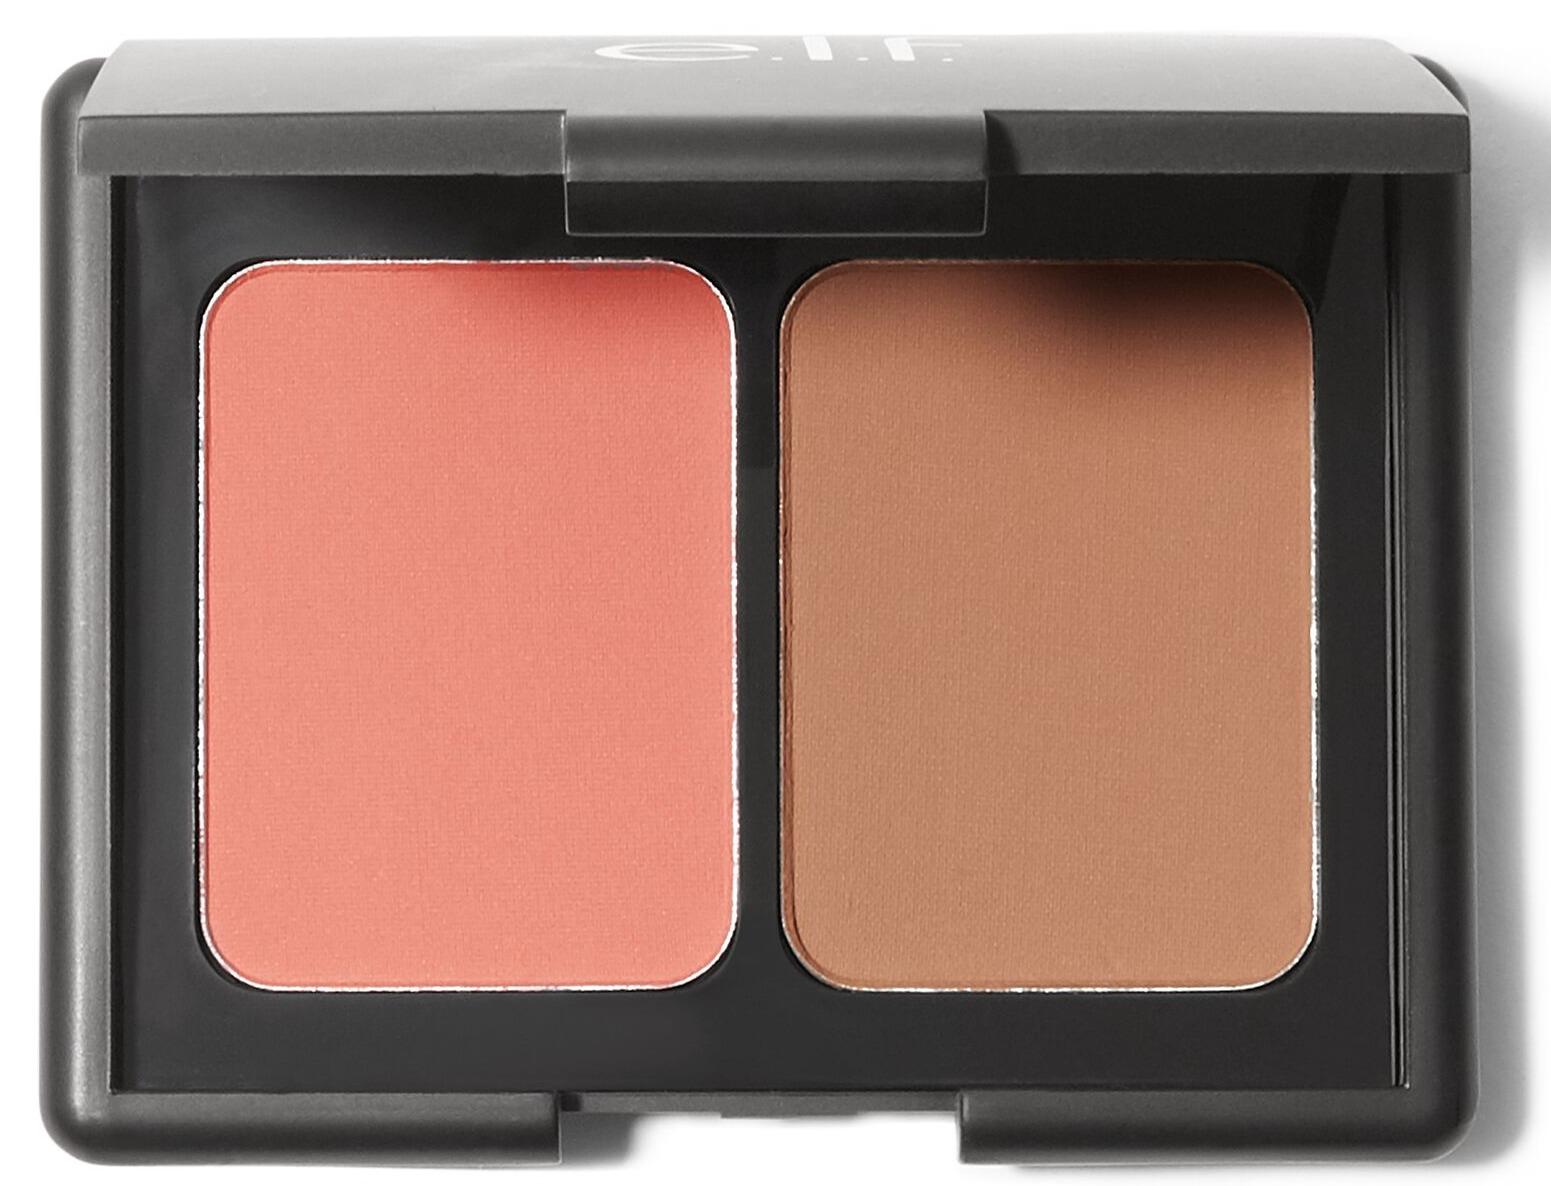 Link to Shop Elf Cosmetics Contouring Blush and Bronzing Powder